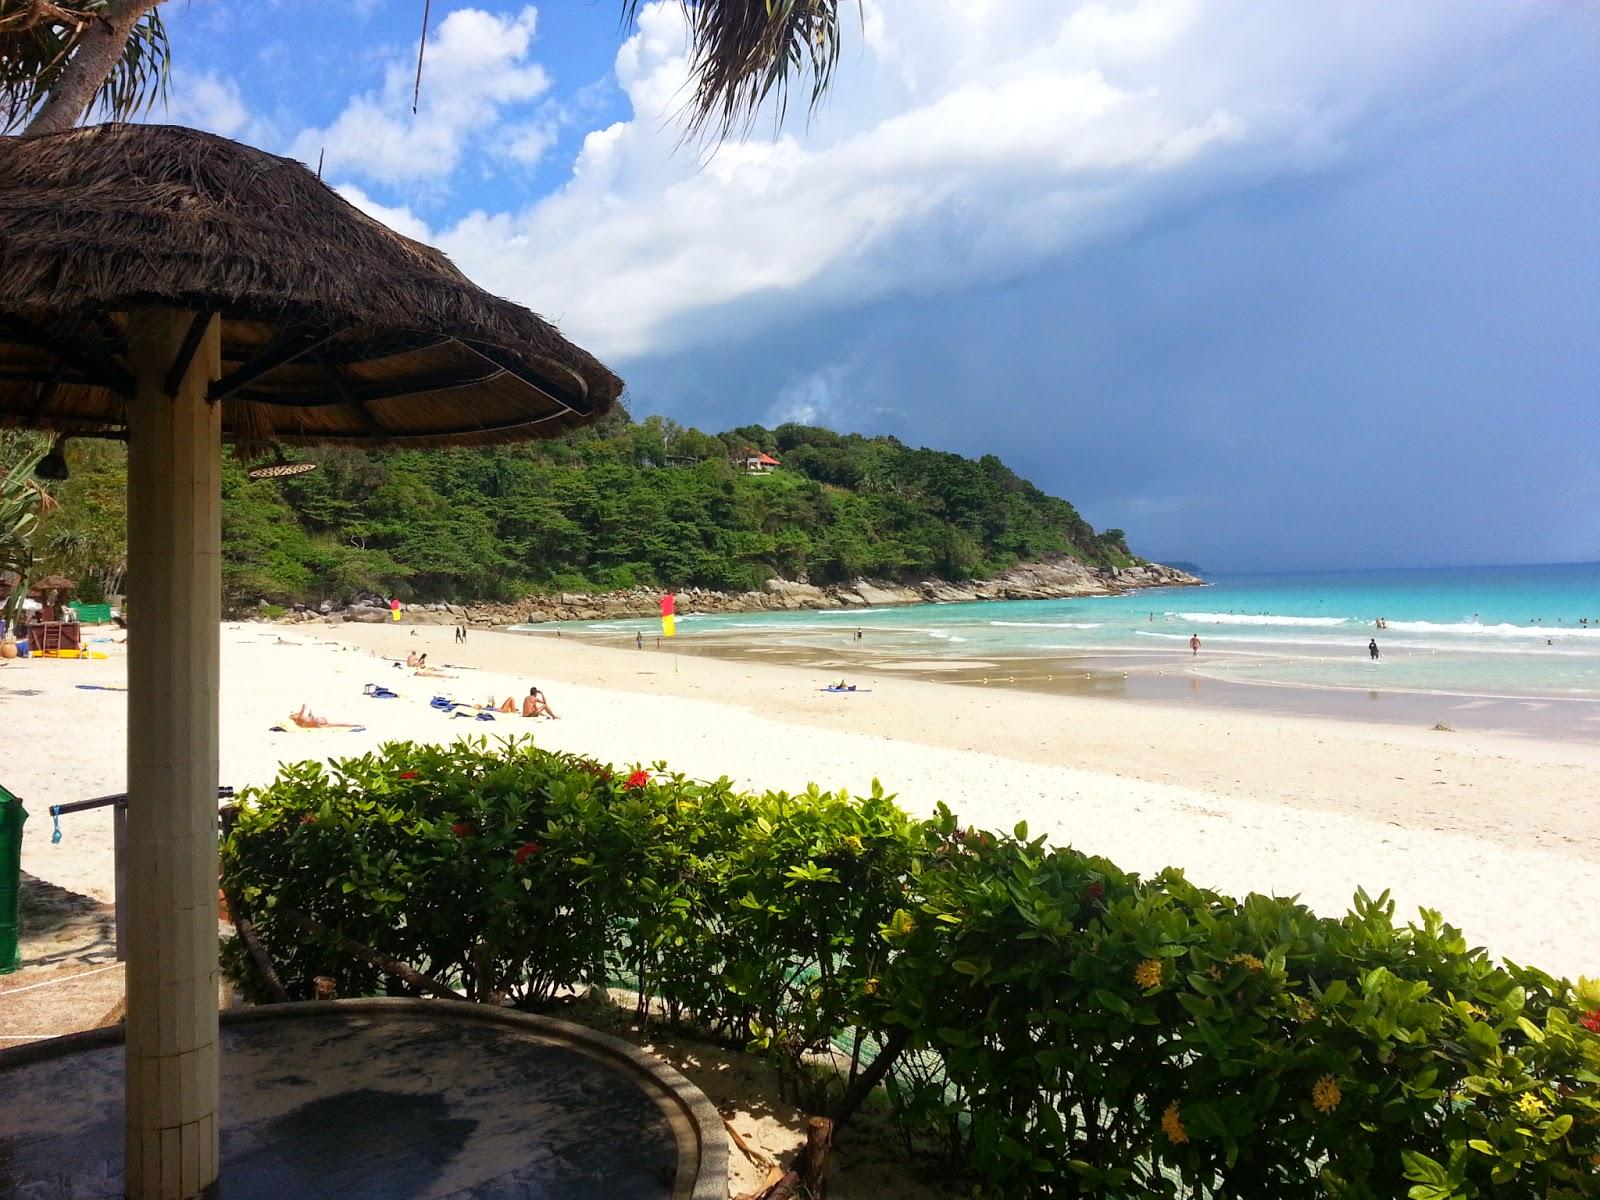 Image Le Meridein beach - Phuket